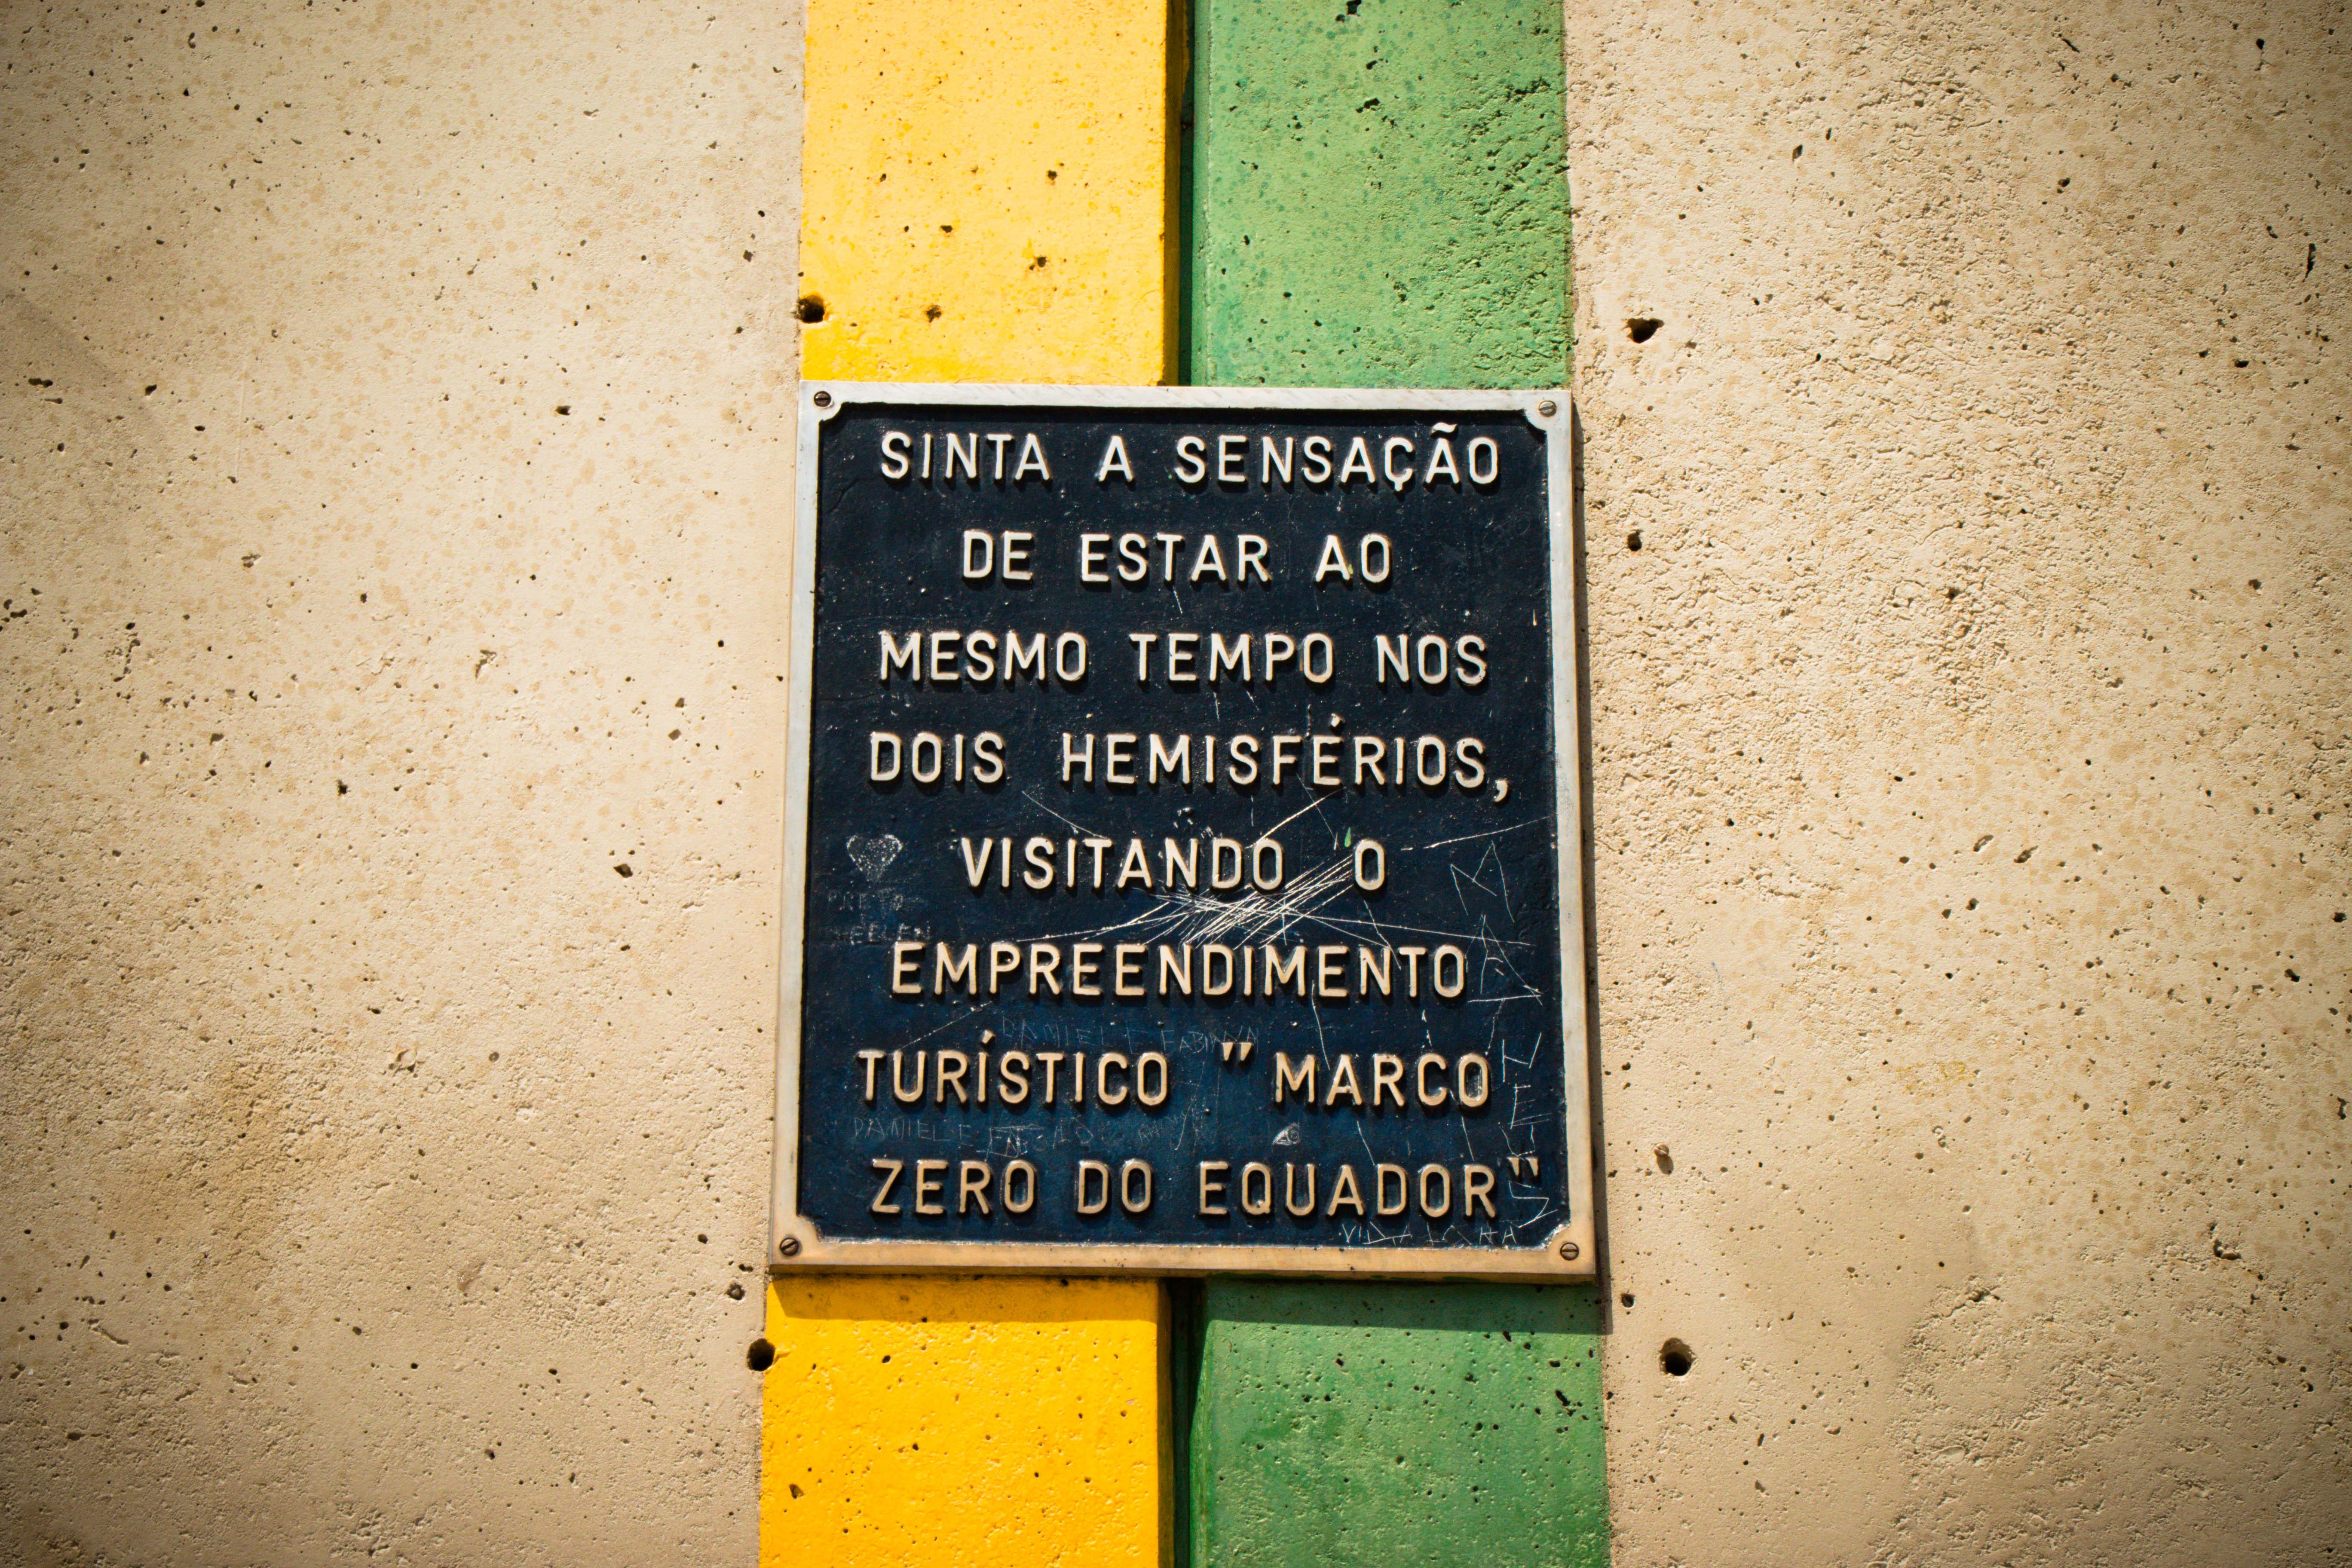 Equinox zero Macapa  Brasil3 - Copie